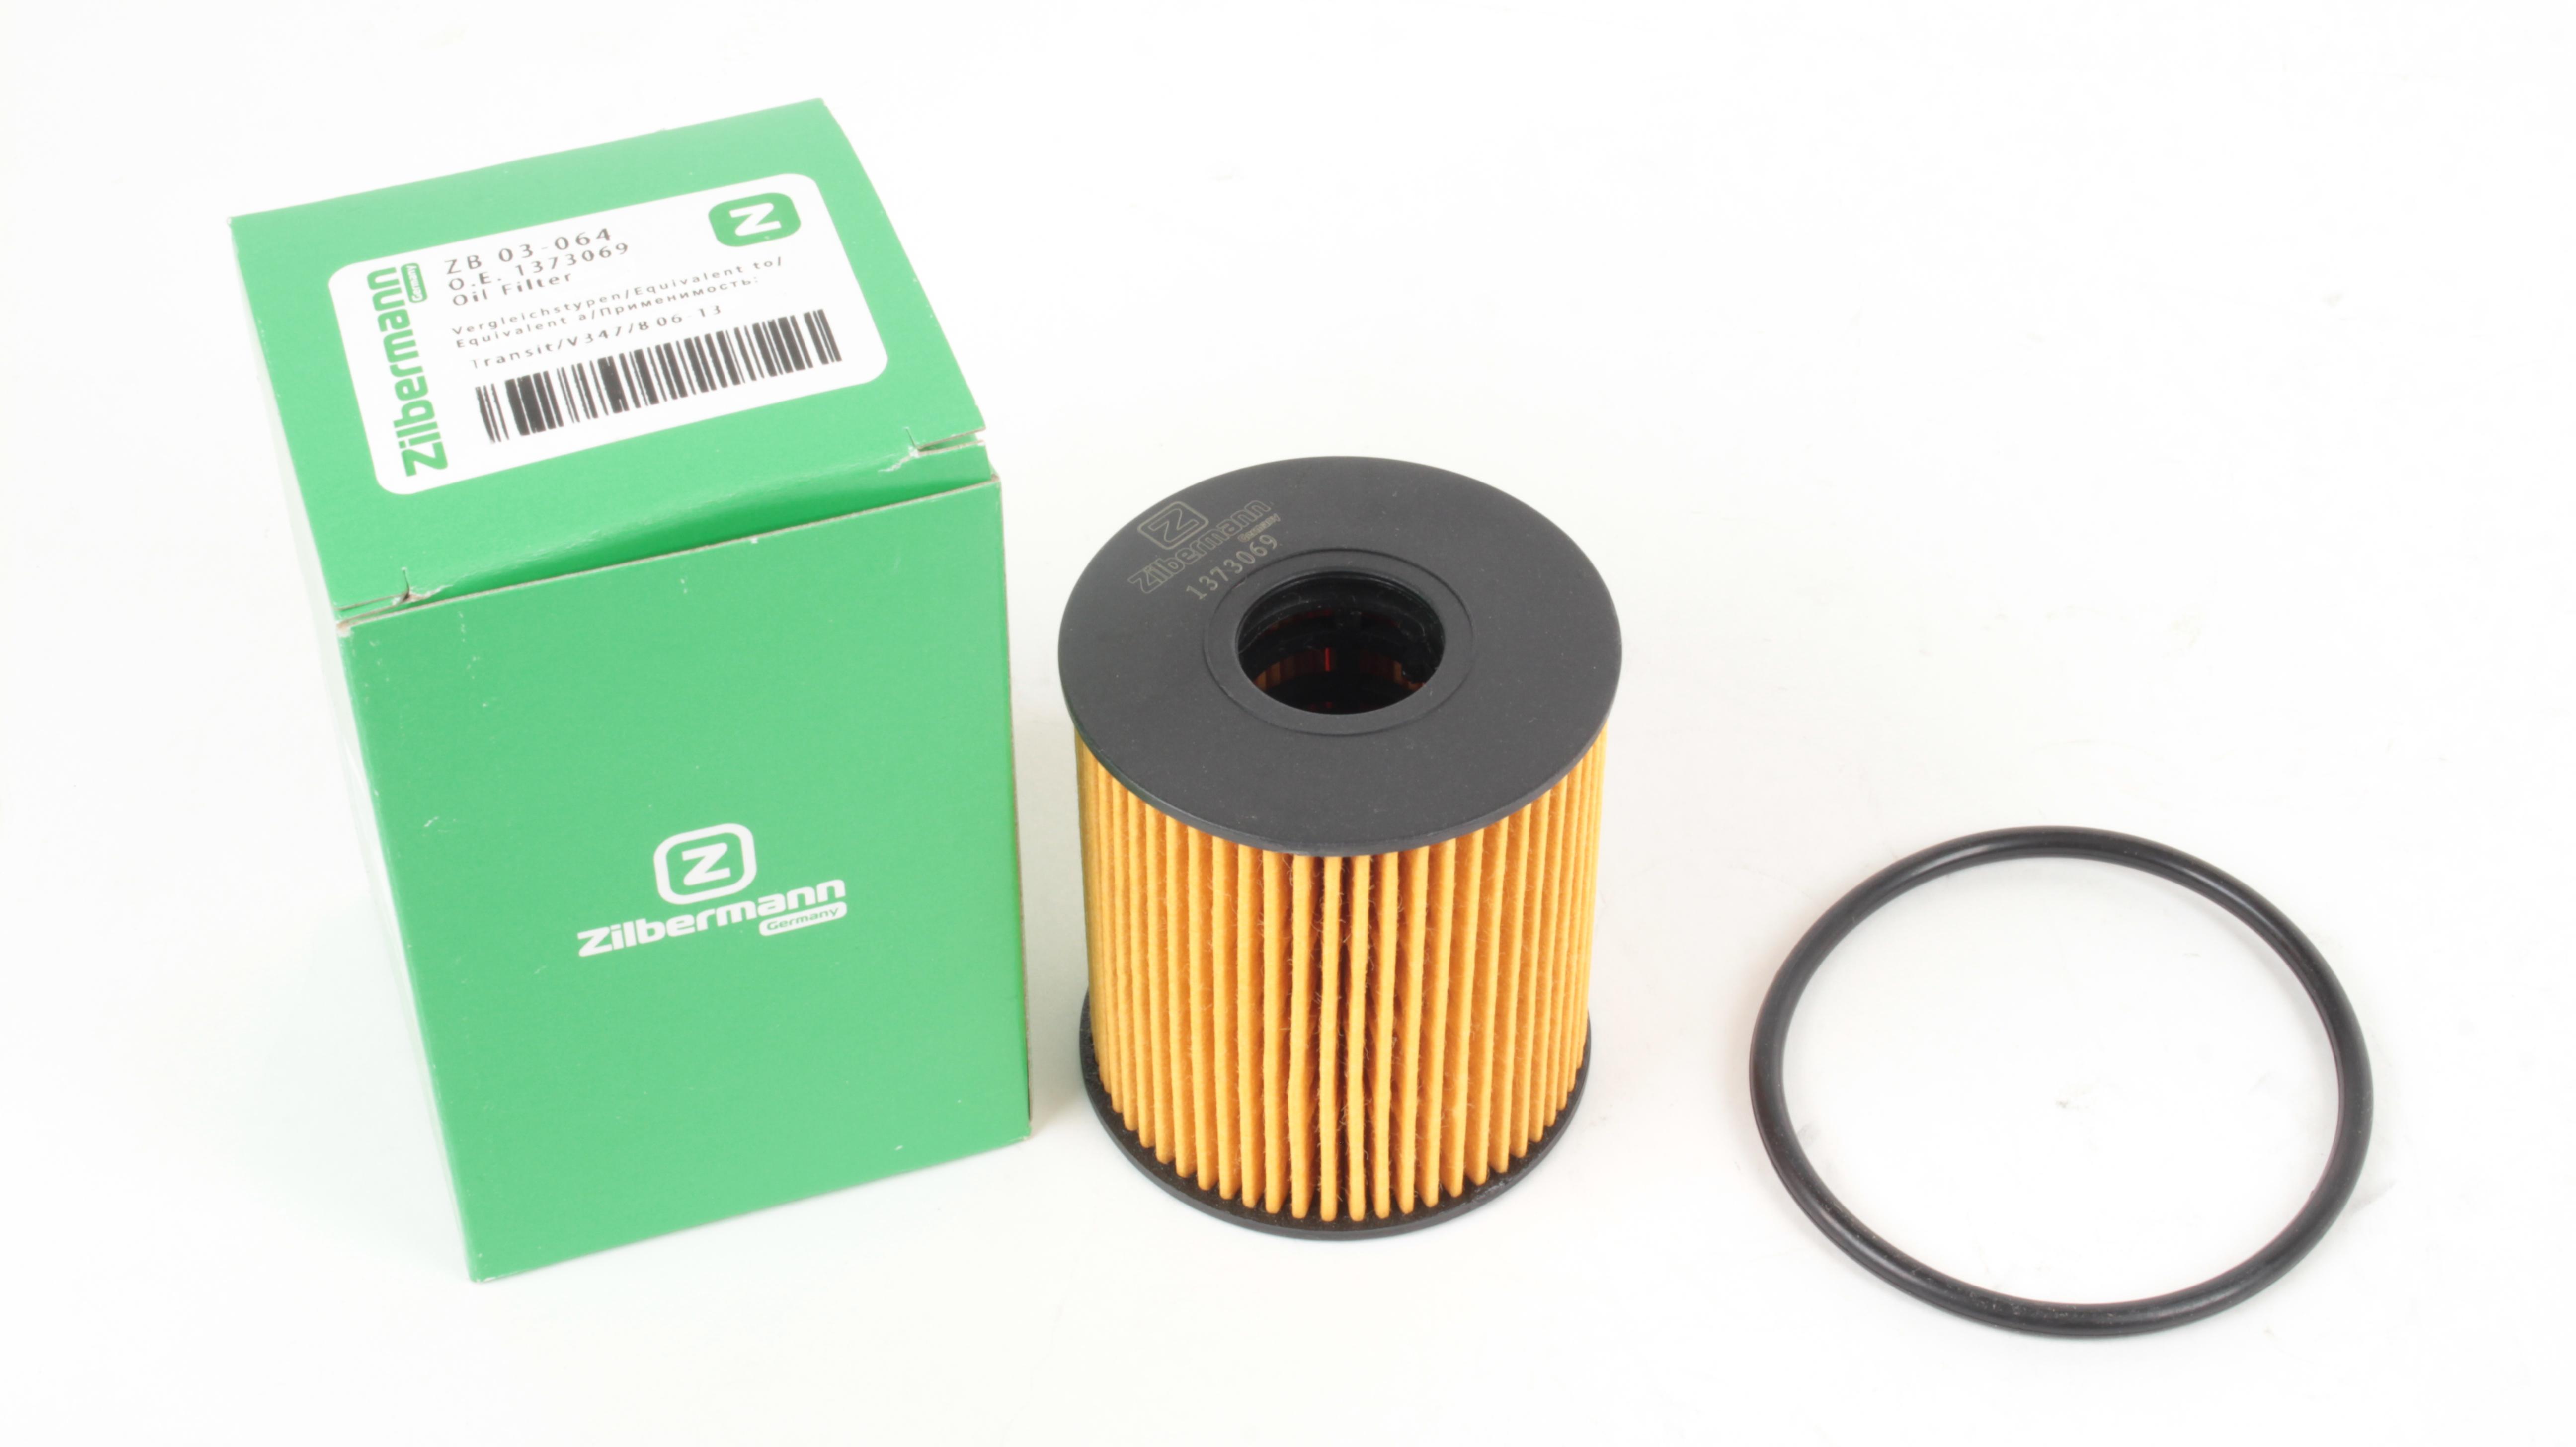 Фильтр масляный, 2.2-2.4TDCI /2.2MJTD/HDI 06- Ducato/Jumper/Boxer